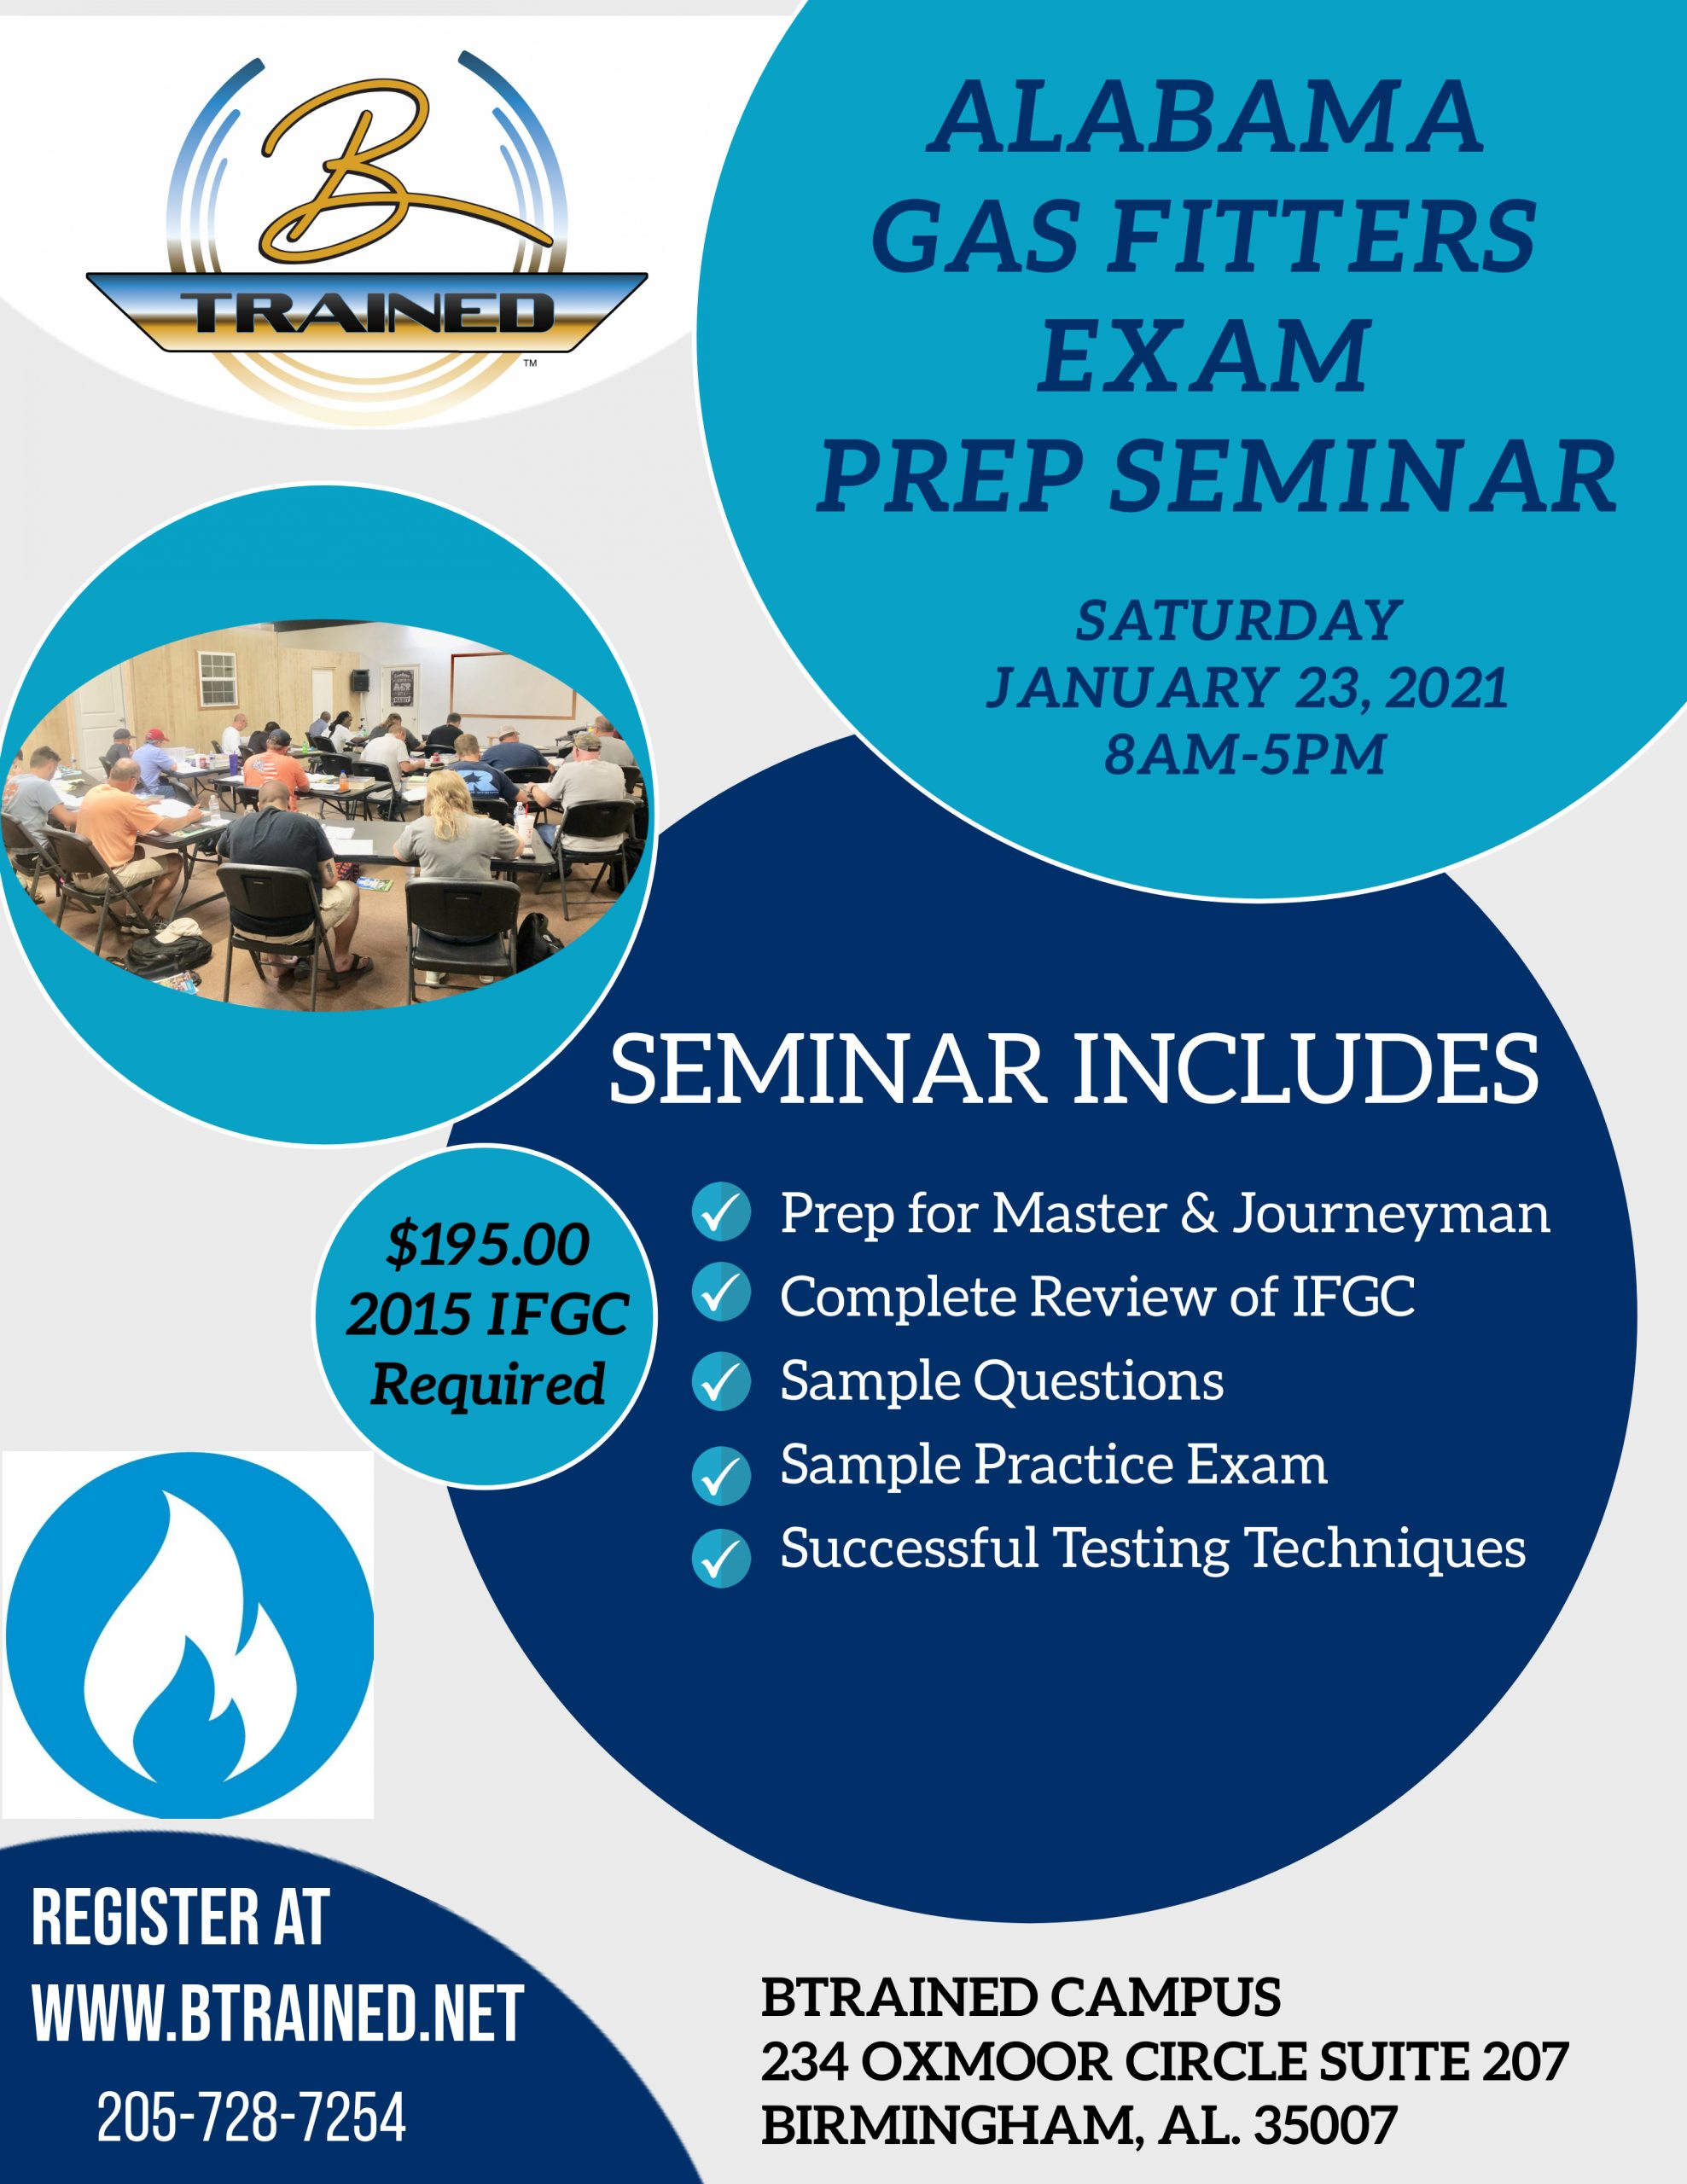 Alabama Gas Fitters Exam Prep Seminar January 23, 2021